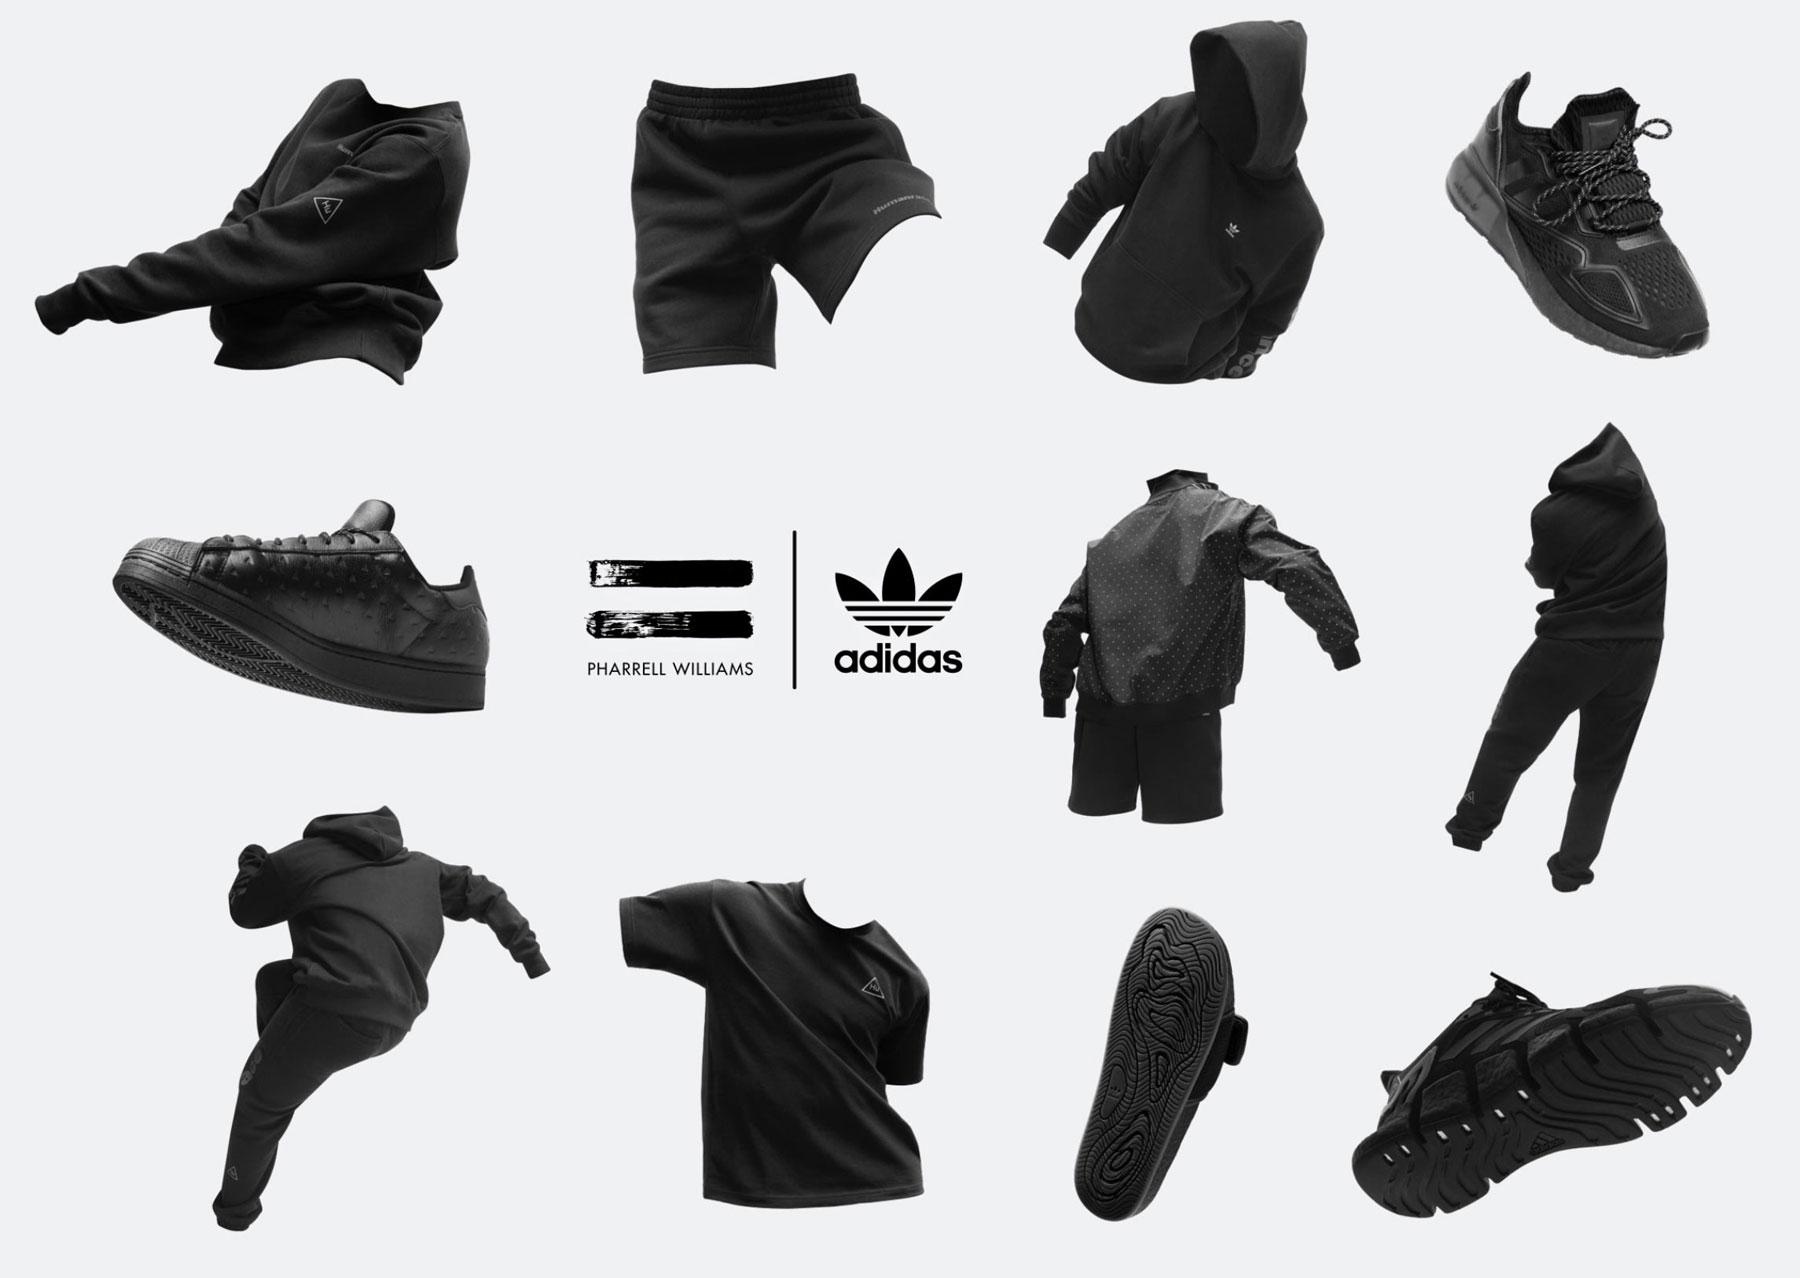 adidas-pharrell-triple-black-sneakers-clothing